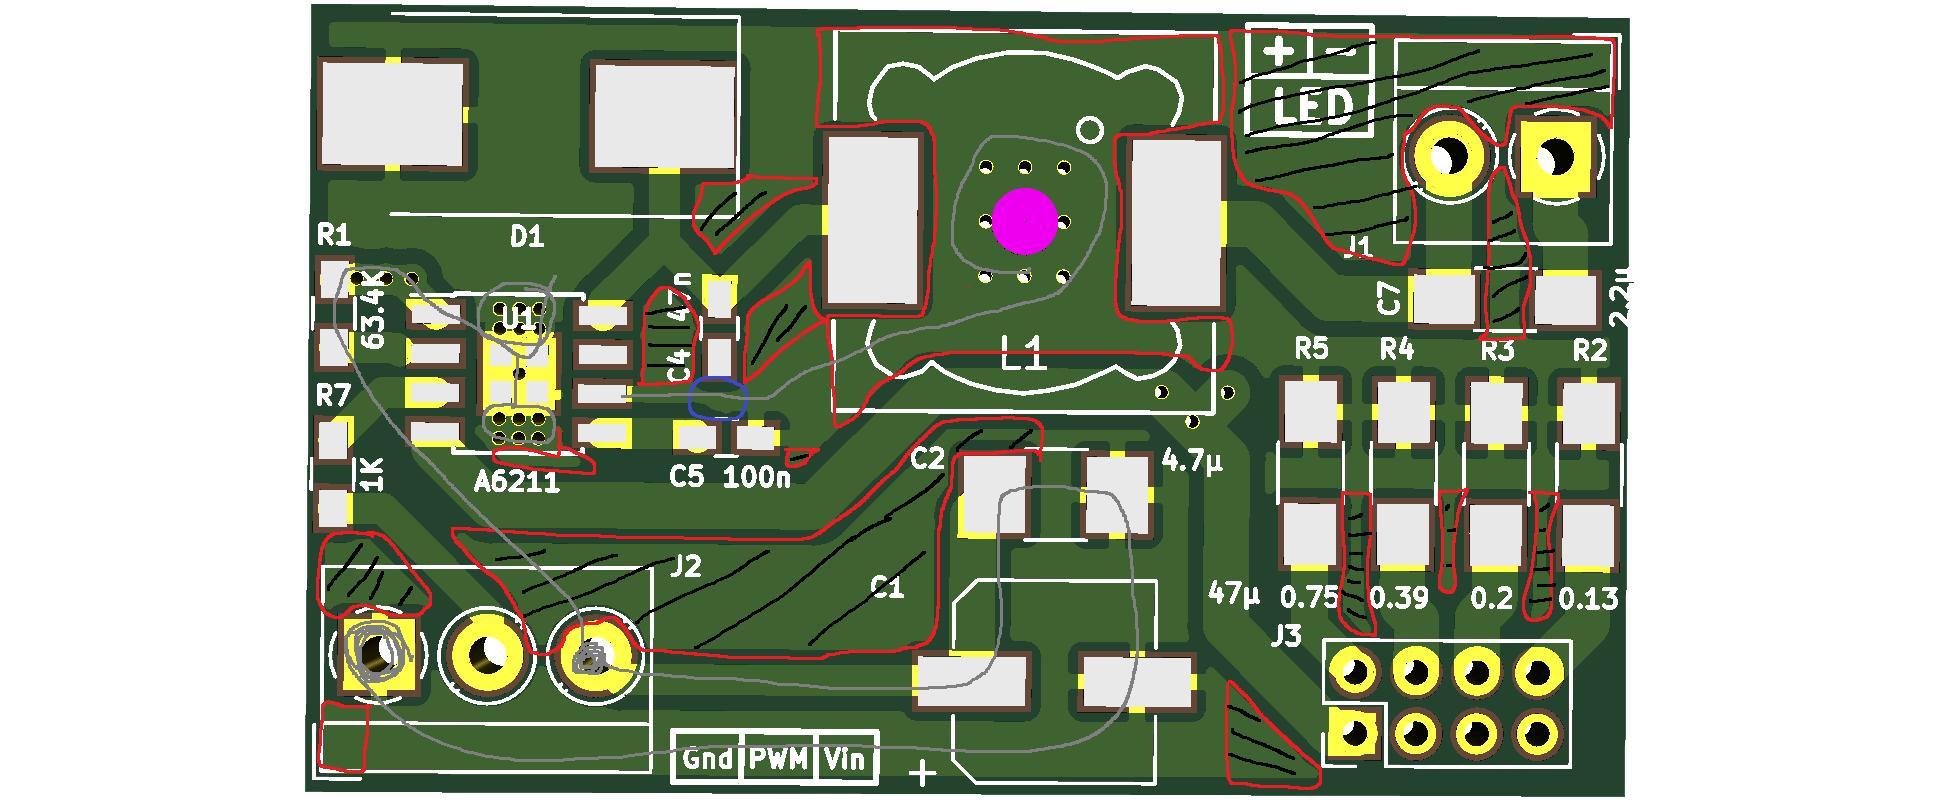 Suche Schaltplan Fr Ksq 2600ma 48v Mit Pwm Konstantstromquelle Fuer Power Led Mikrocontrollernet Preview Image For S1